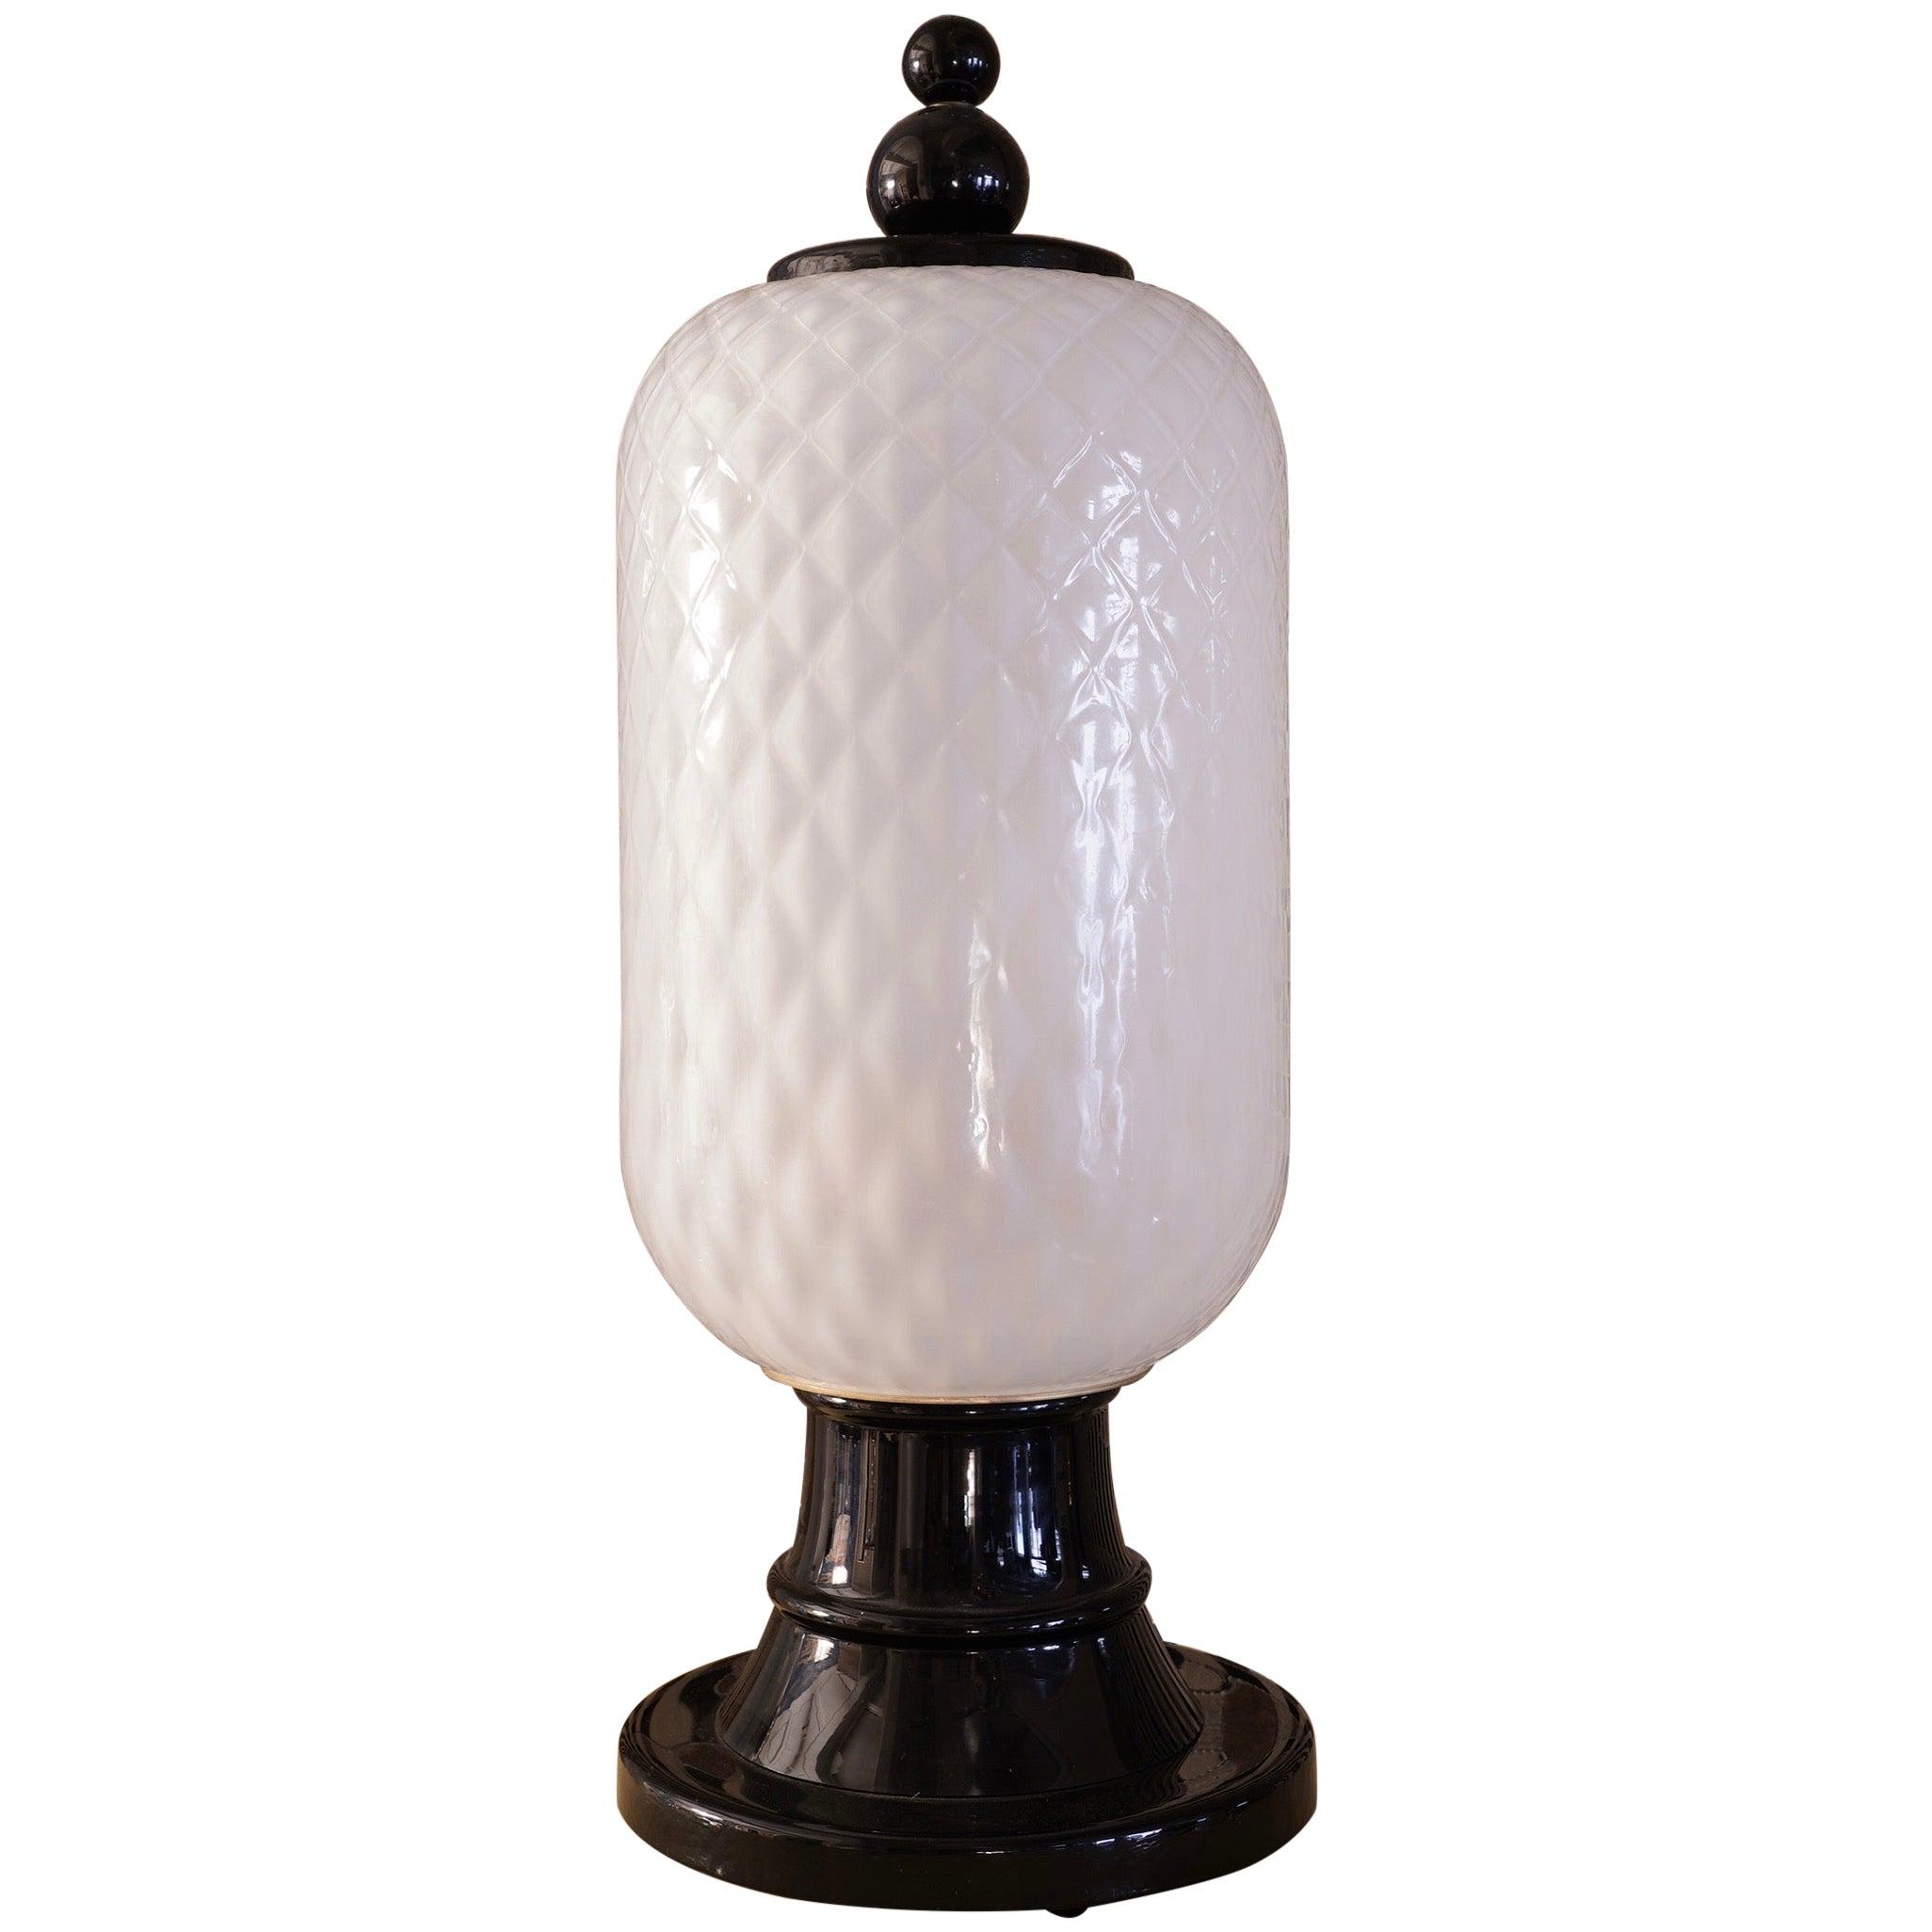 Murano Art Glass Italian Midcentury Table Lamps, 1960